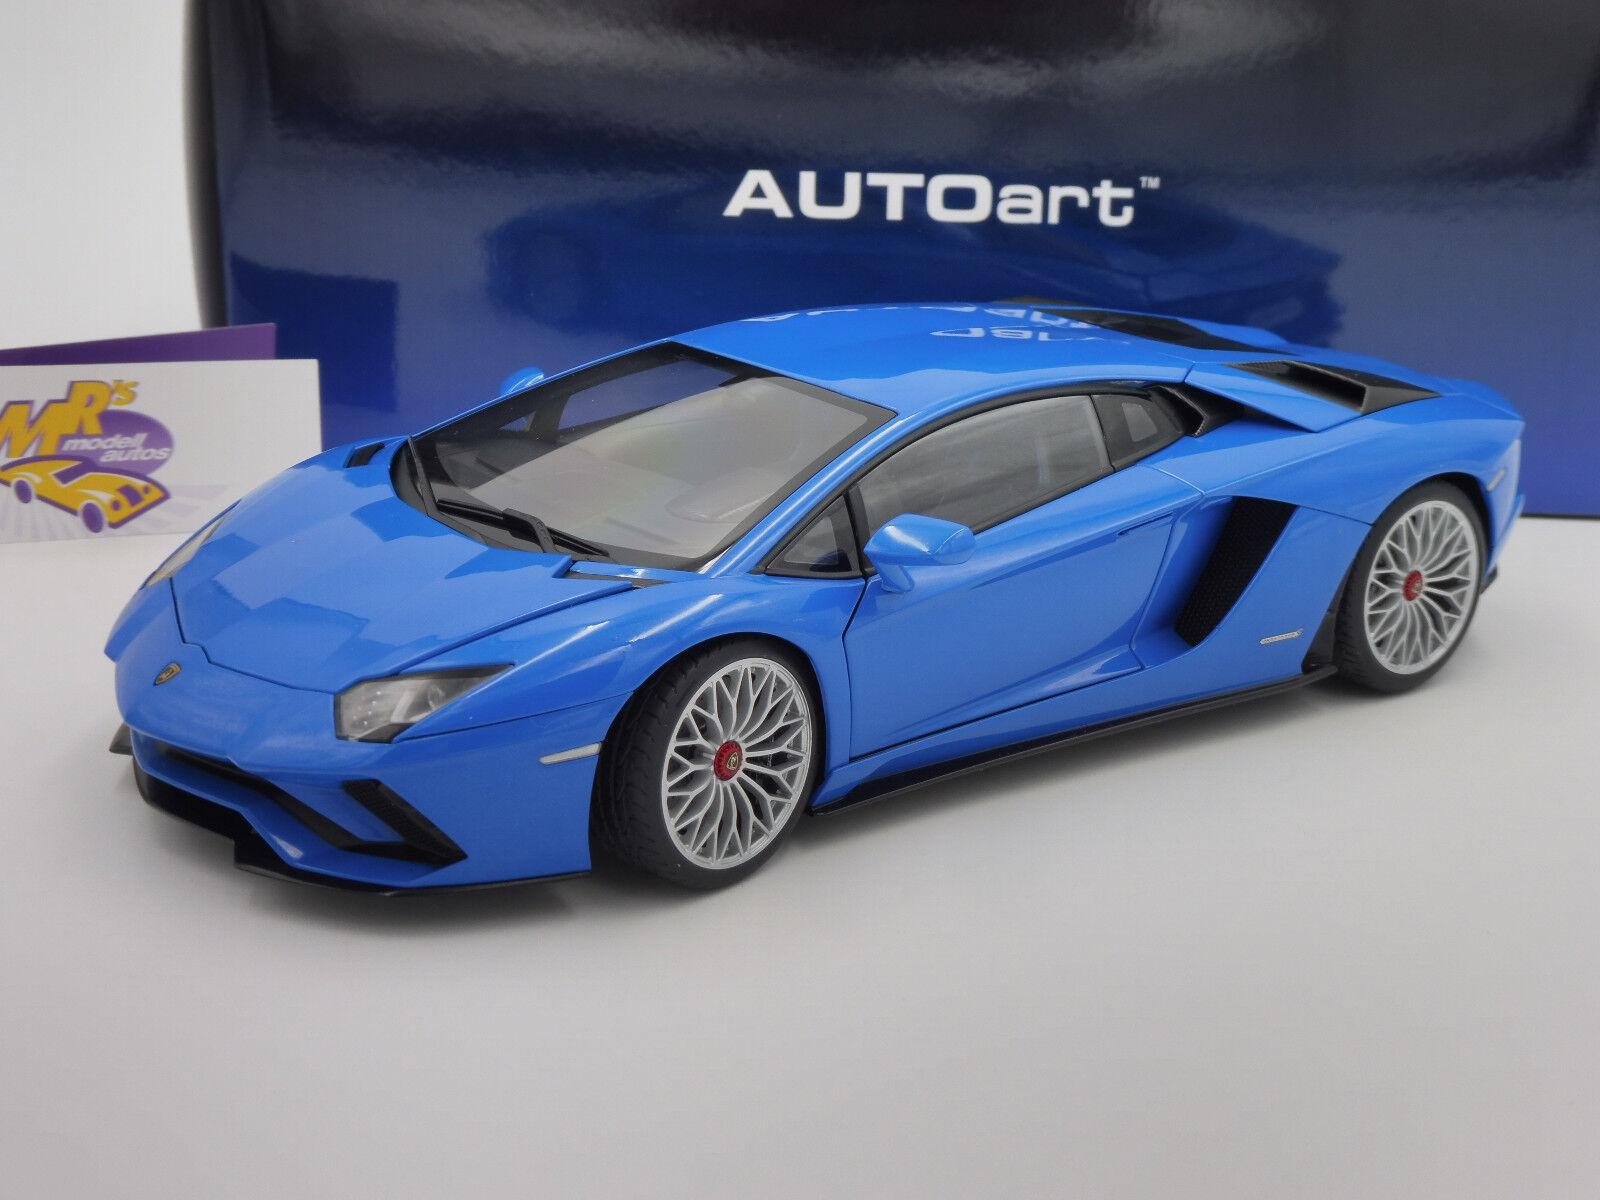 AUTOART 79134   Lamborghini Aventador S Année 2017  Pearl bleu  1 18 NEUF